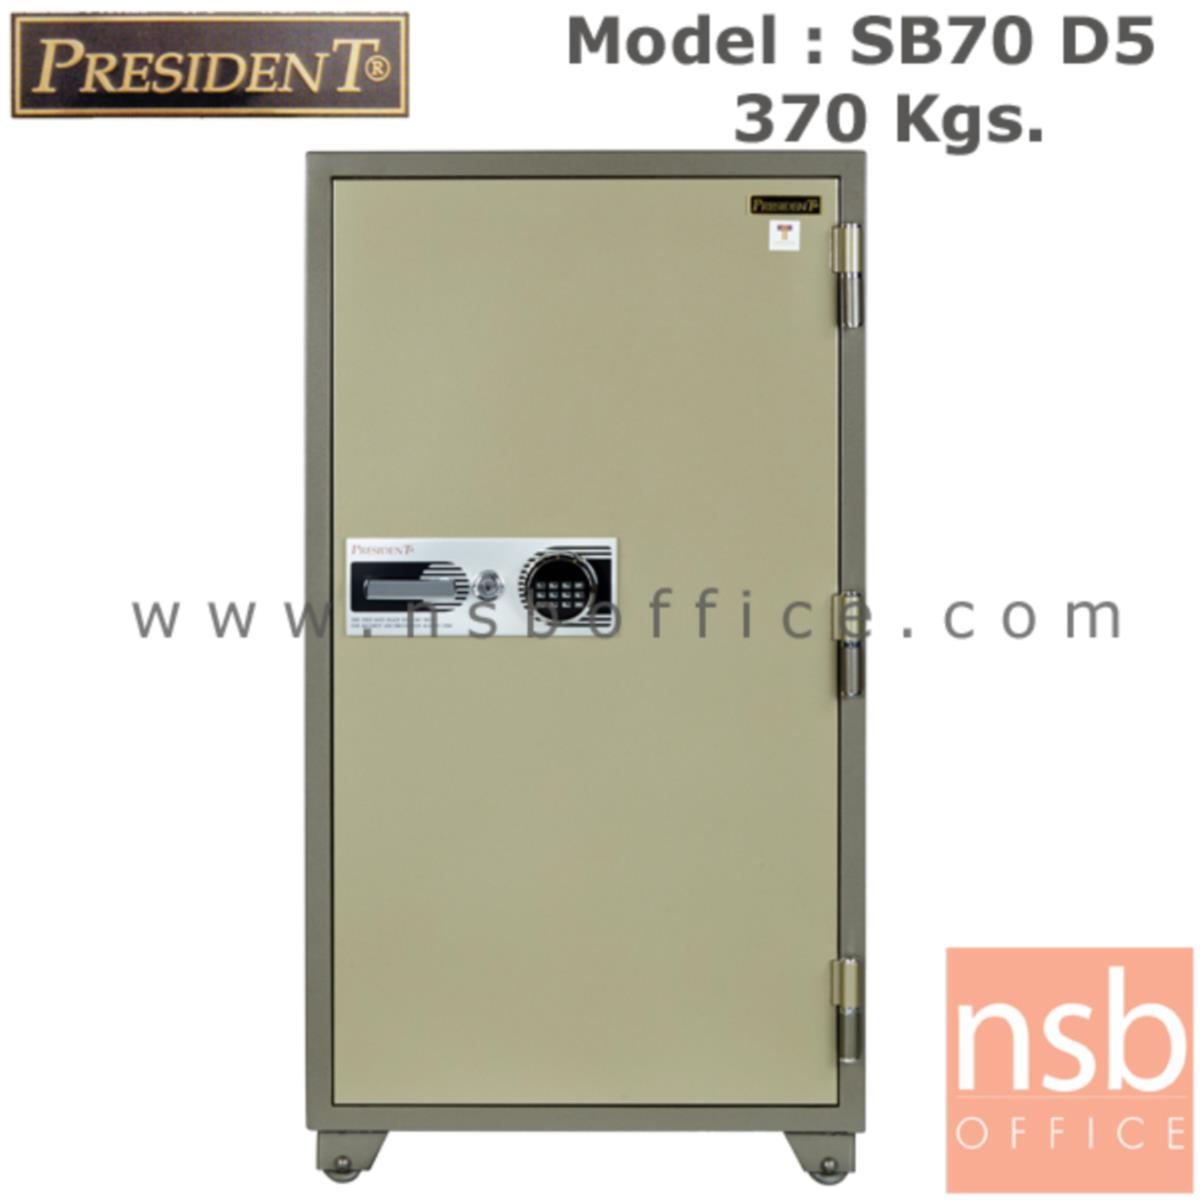 F05A065:ตู้เซฟนิรภัยชนิดดิจิตอลแบบใหม่ 370 กก.  รุ่น PRESIDENT-SB70D5  มี 1 กุญแจ 1 รหัส (รหัสใช้กดหน้าตู้)